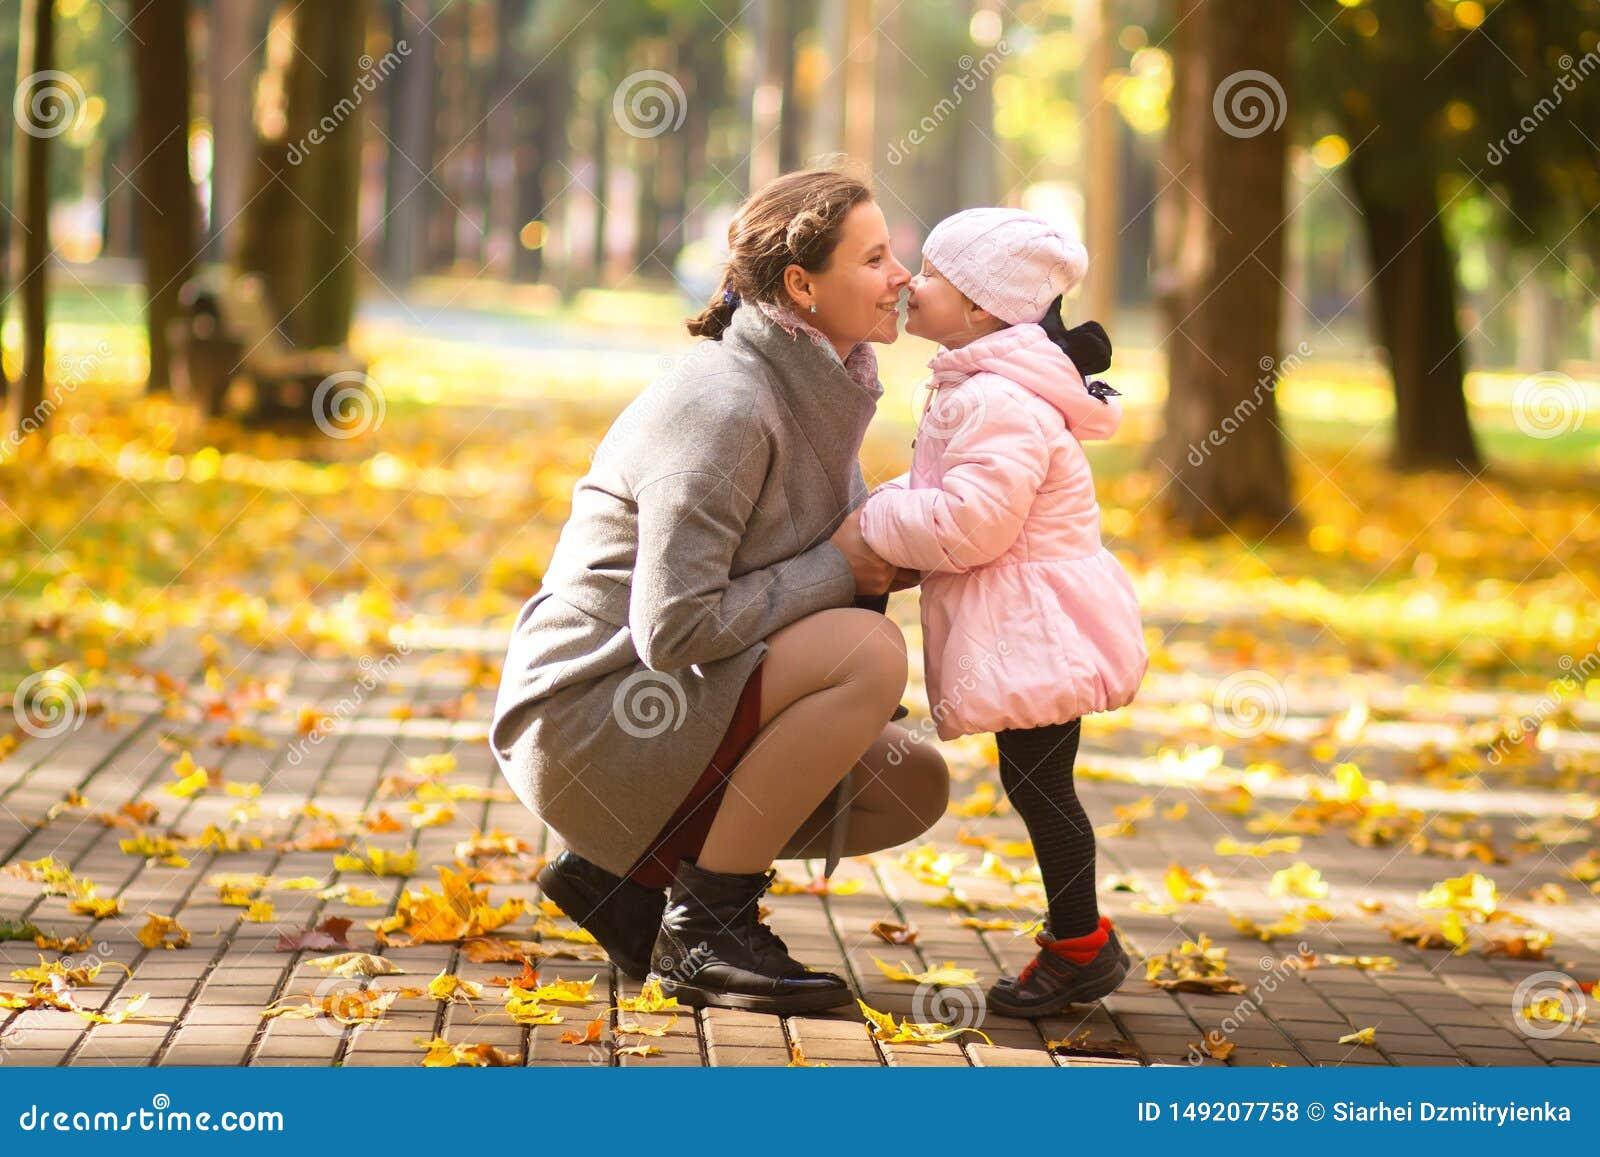 Familia Madre e hija en parque del oto?o Madre con el ni?o en al aire libre